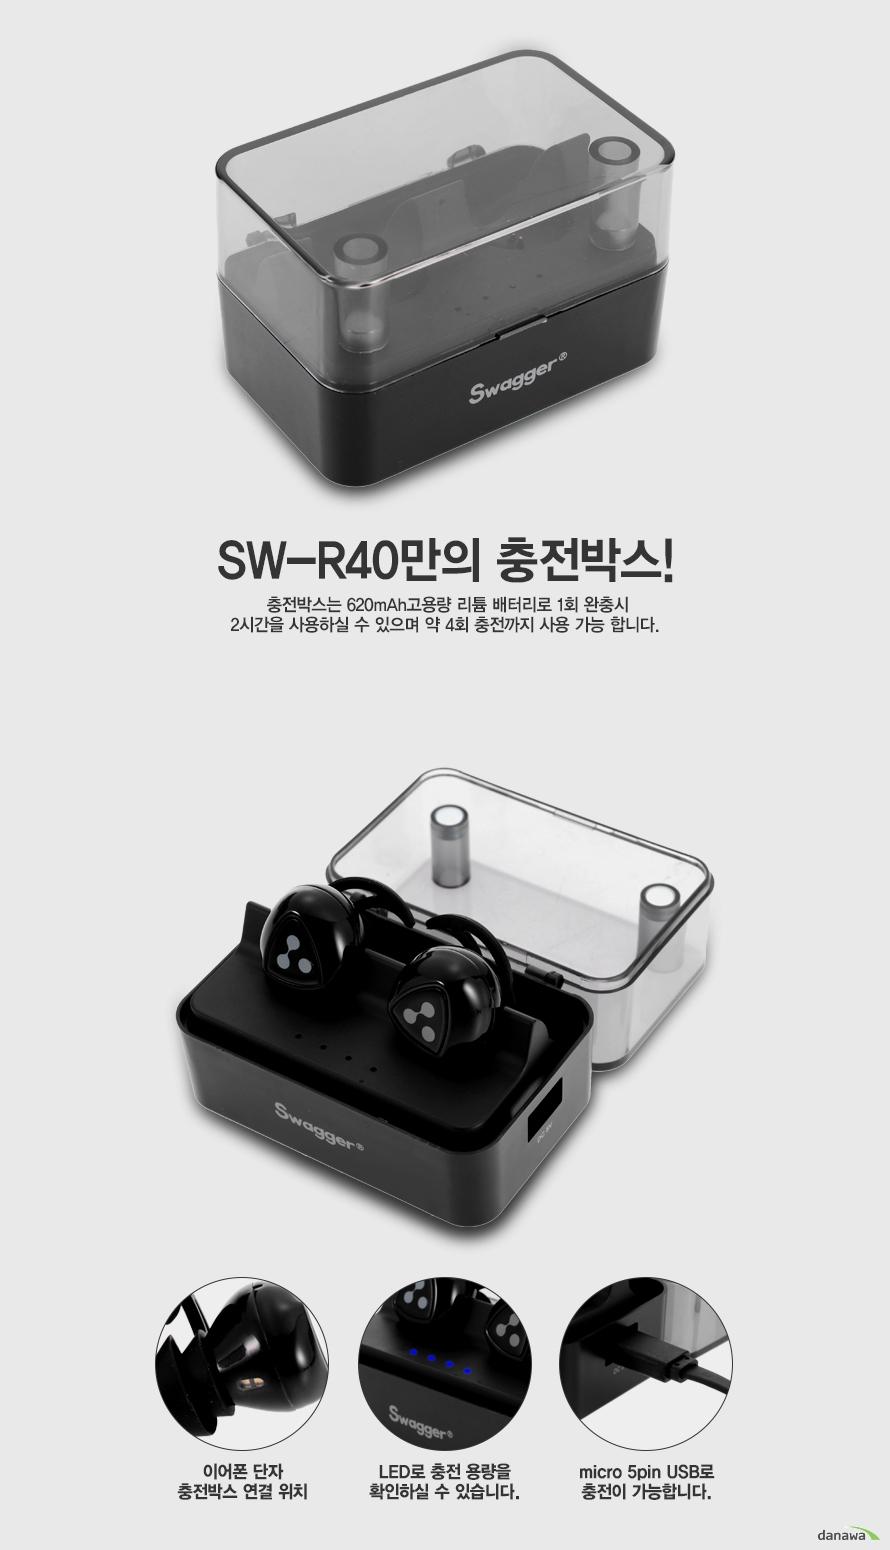 SW-R40만의 충전박스!충전박스는 620mAh고용량 리튬 배터리로 1회 완충시 2시간을 사용하실 수 있으며 약 4회 충전까지 사용 가능 합니다. 이어폰 단자 충전박스 연결 위치LED로 충전 용량을 확인하실 수 있습니다.micro 5pin USB로 충전이 가능합니다.